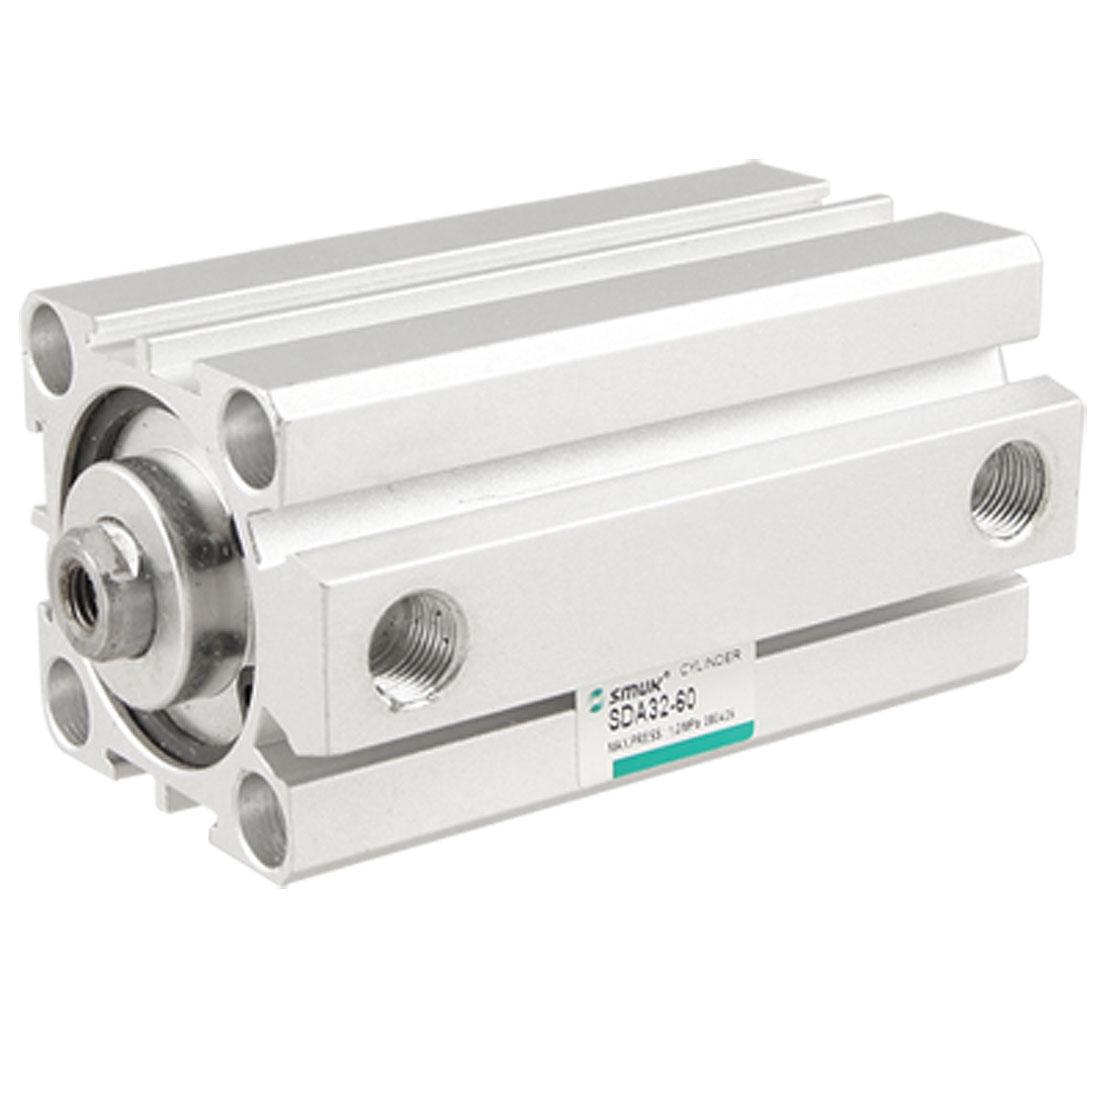 SDA32-60 Dual Action Single Rod Pneumatic Air Cylinder